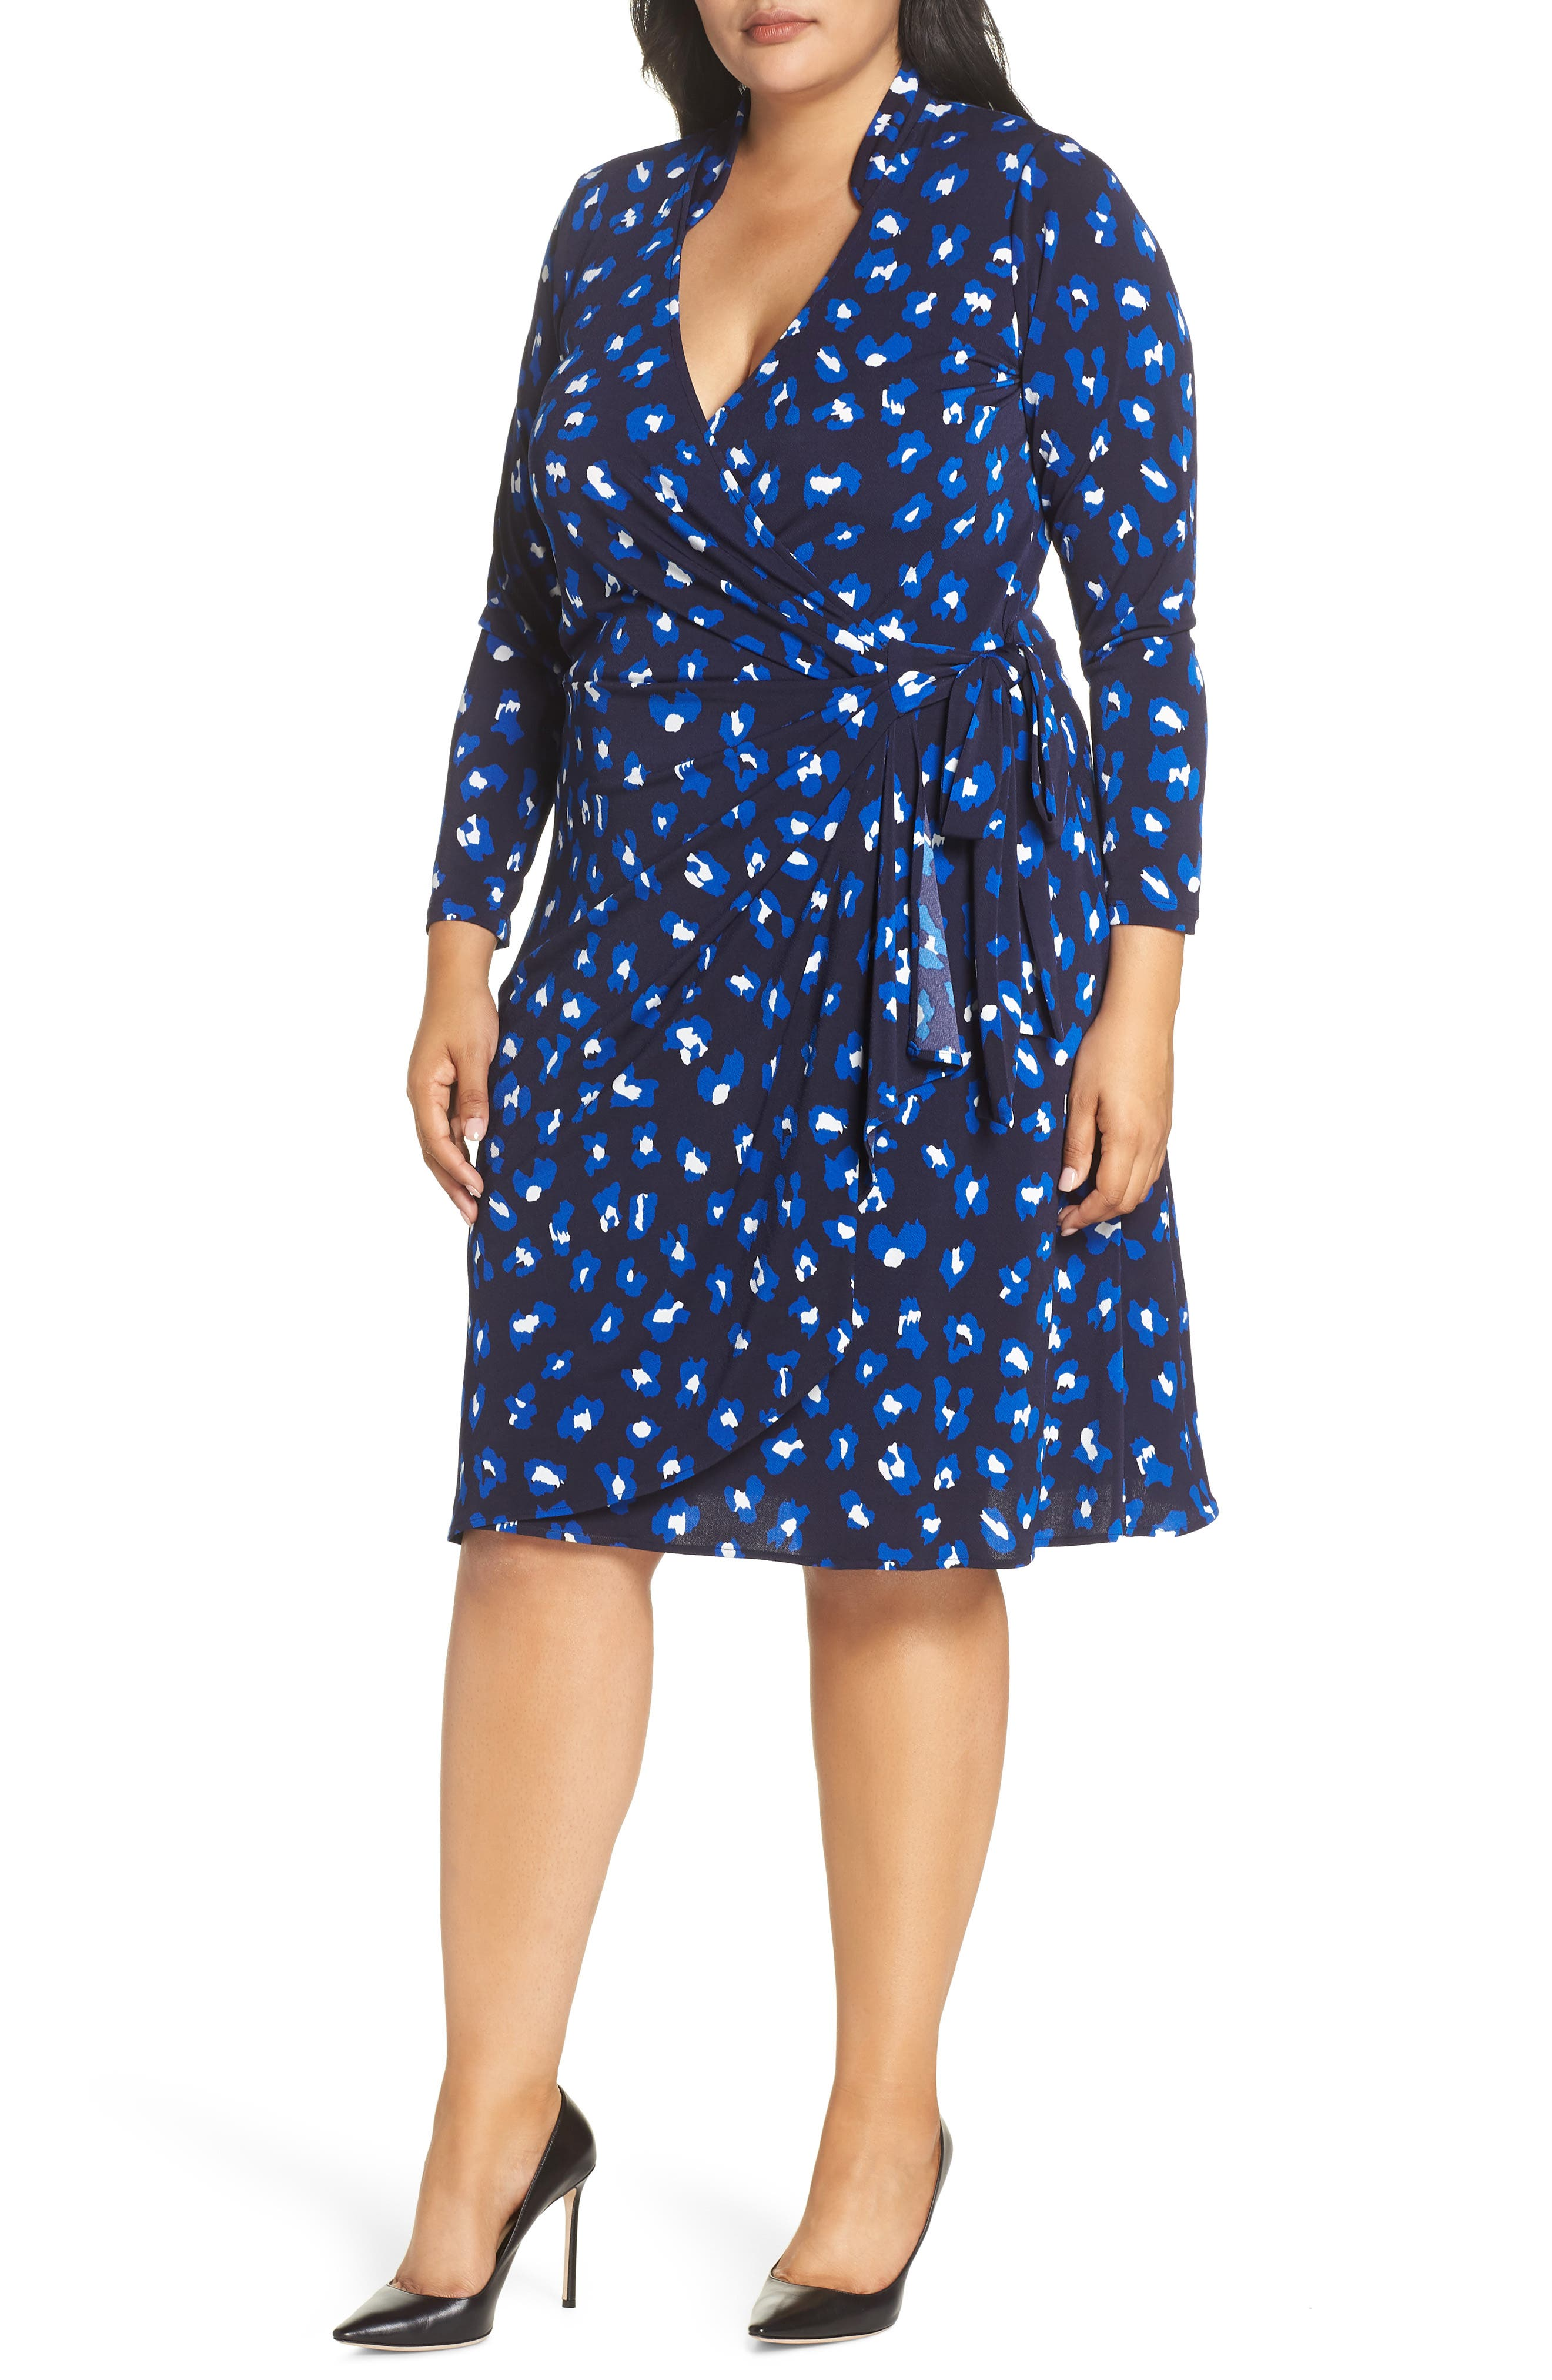 LEOTA Gabrielle Wrap Dress in Cheetah Spot-Cn